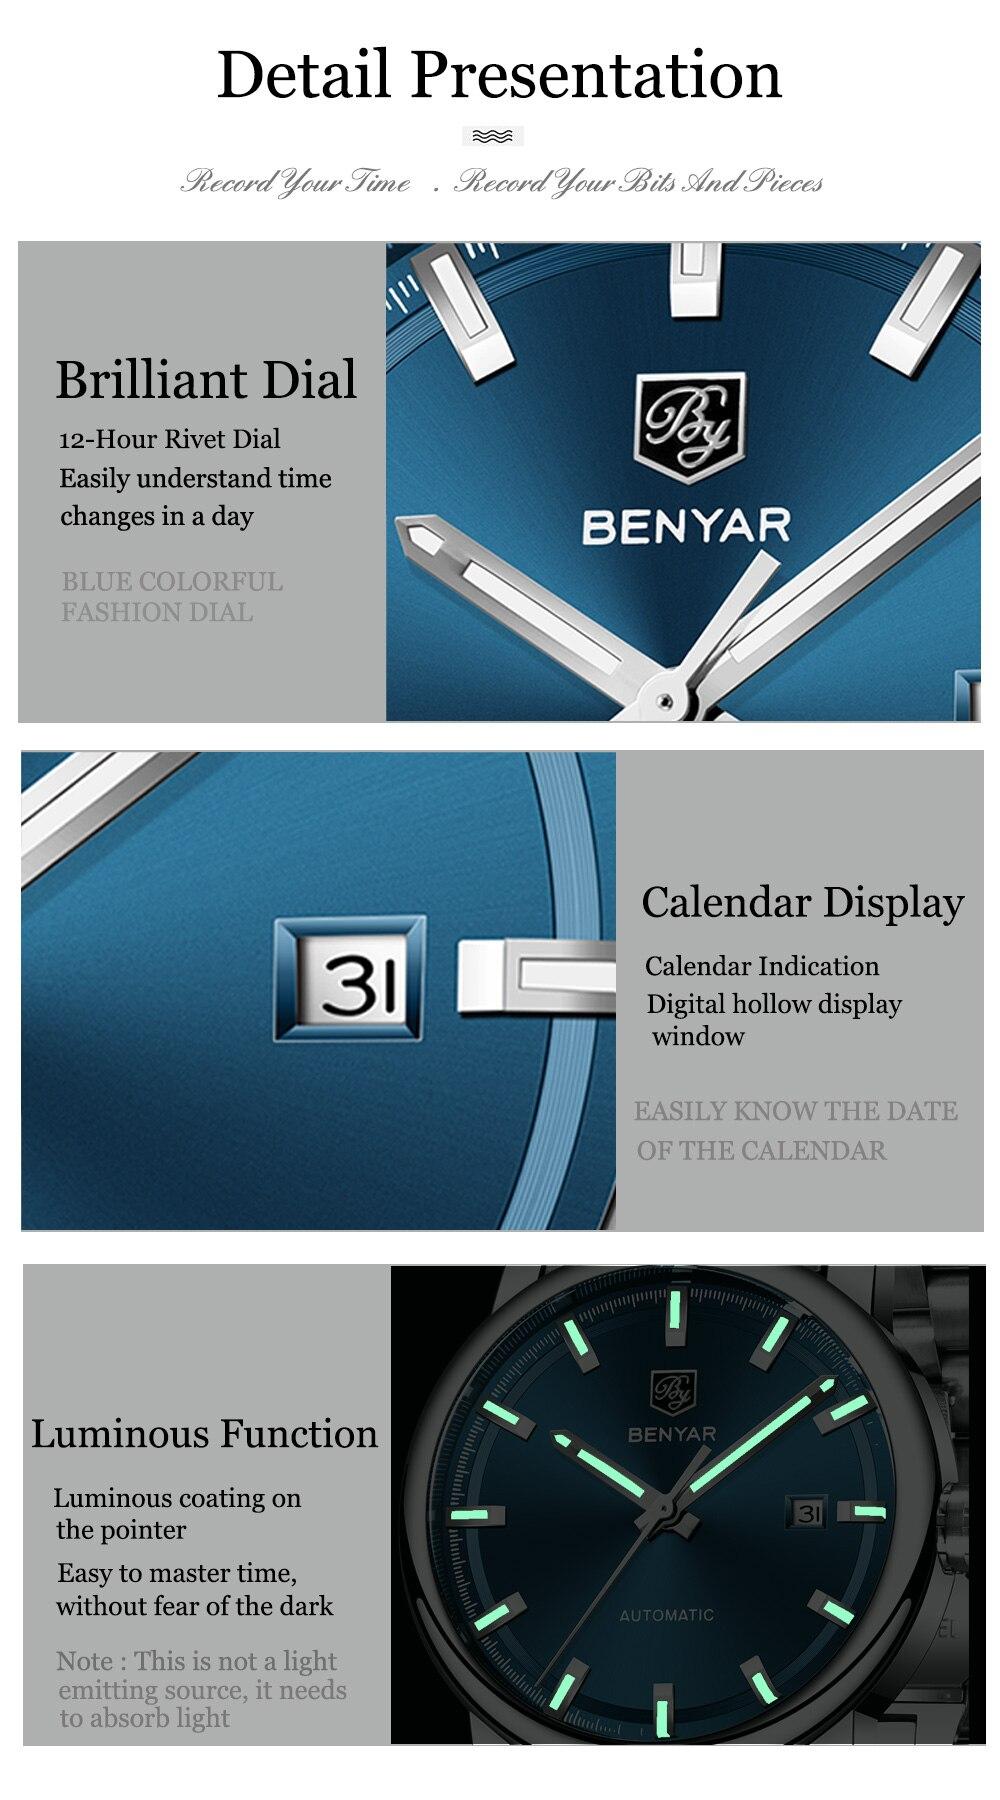 HTB1MQaba3aH3KVjSZFpq6zhKpXak New BENYAR Men's Mechanical Watches Automatic Mens watches Top Brand Luxury watch men WristWatch Military Relogio Masculino 2019